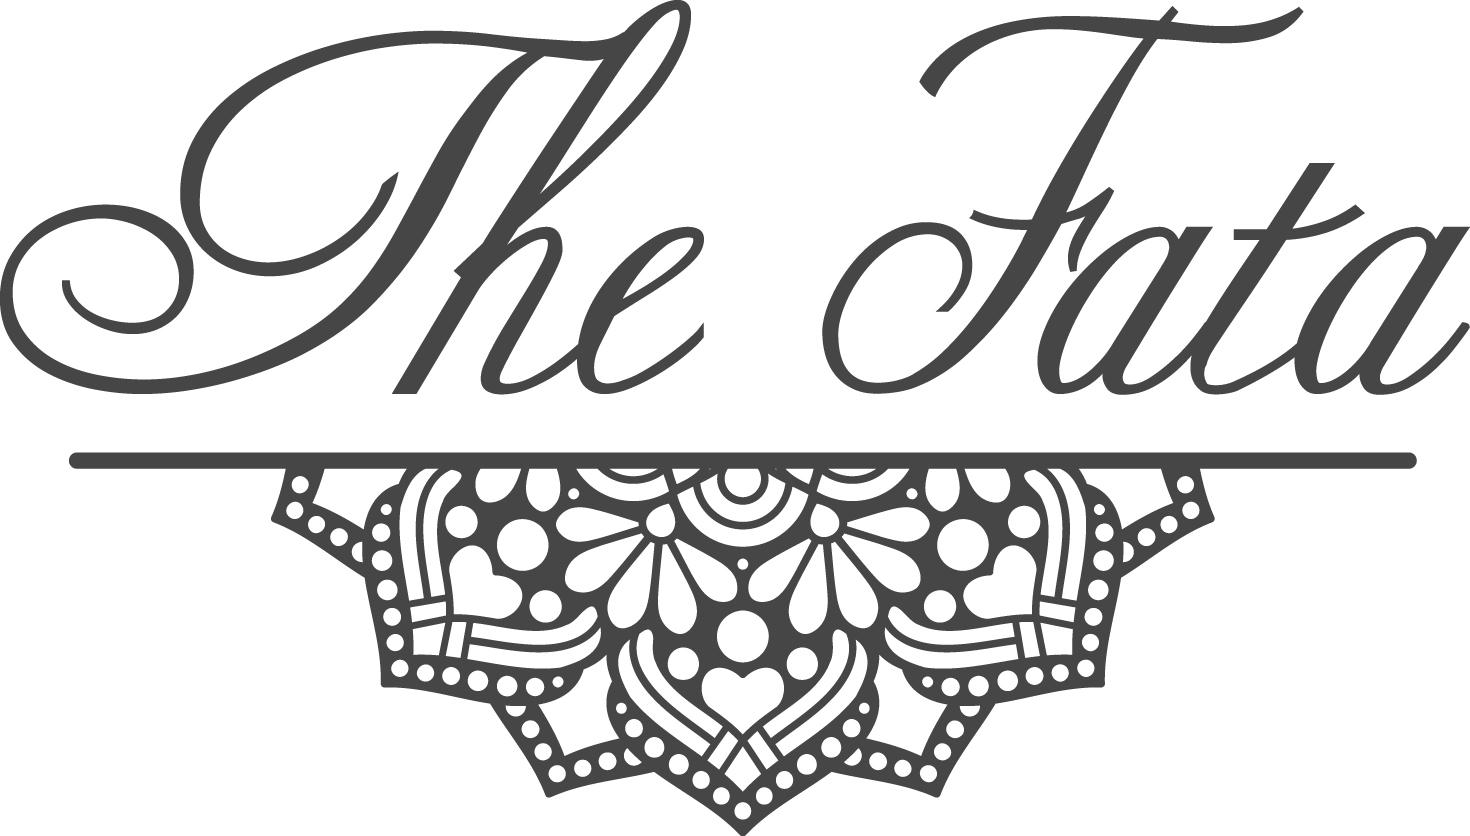 The Fata